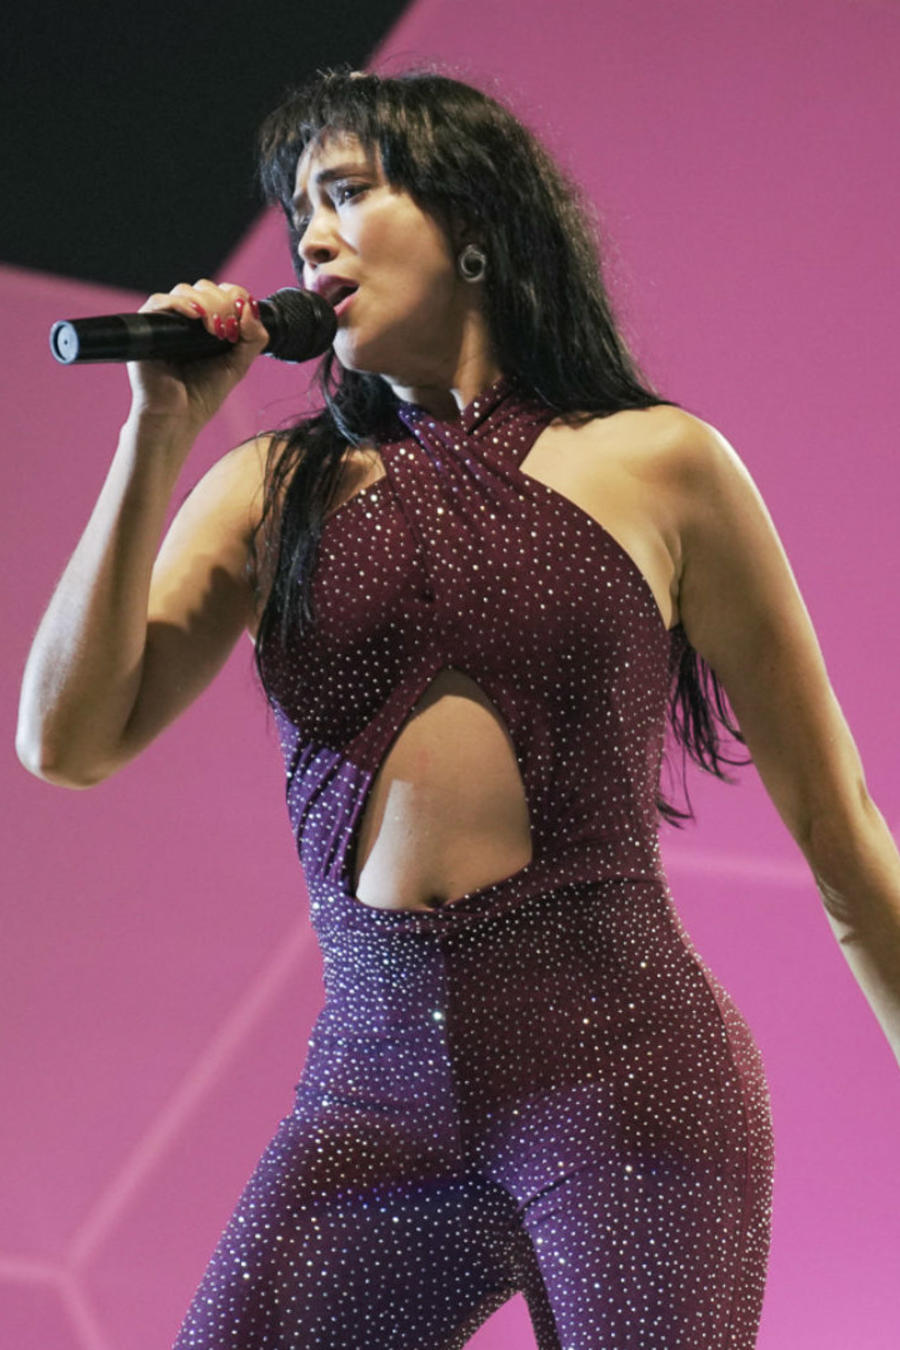 The International Hit Series 'El Secreto de Selena' Reveals First Trailer: Watch